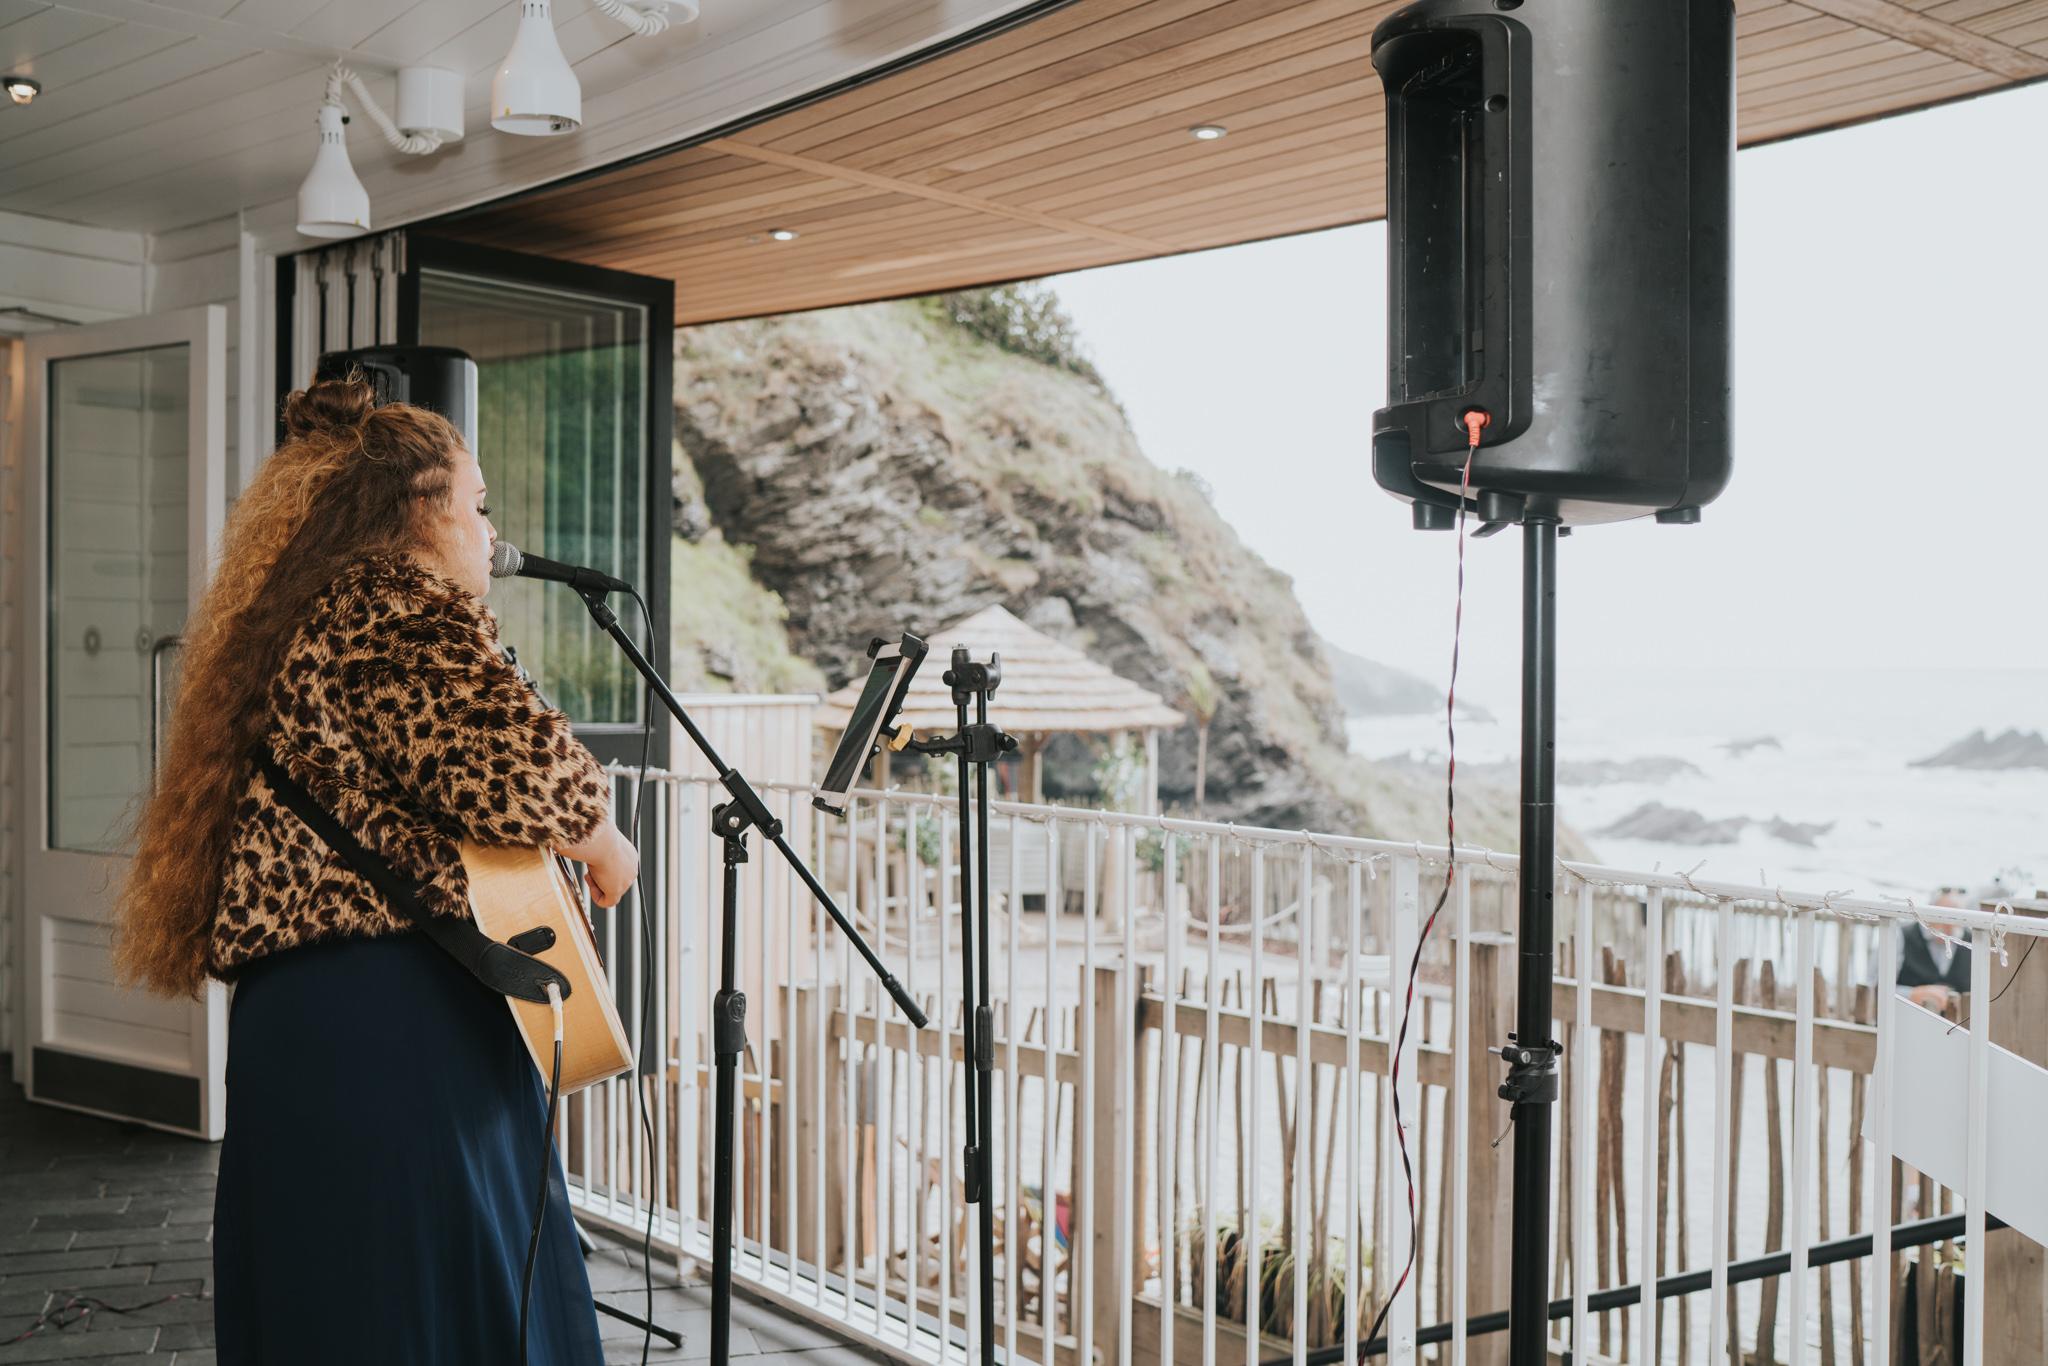 john-amy-relaxed-beach-wedding-tunnels-beaches-ilfracombe-north-devon-grace-elizabeth-colchester-essex-alternative-relaxed-wedding-photography-devon-suffolk-norfolk-essex (85 of 159).jpg